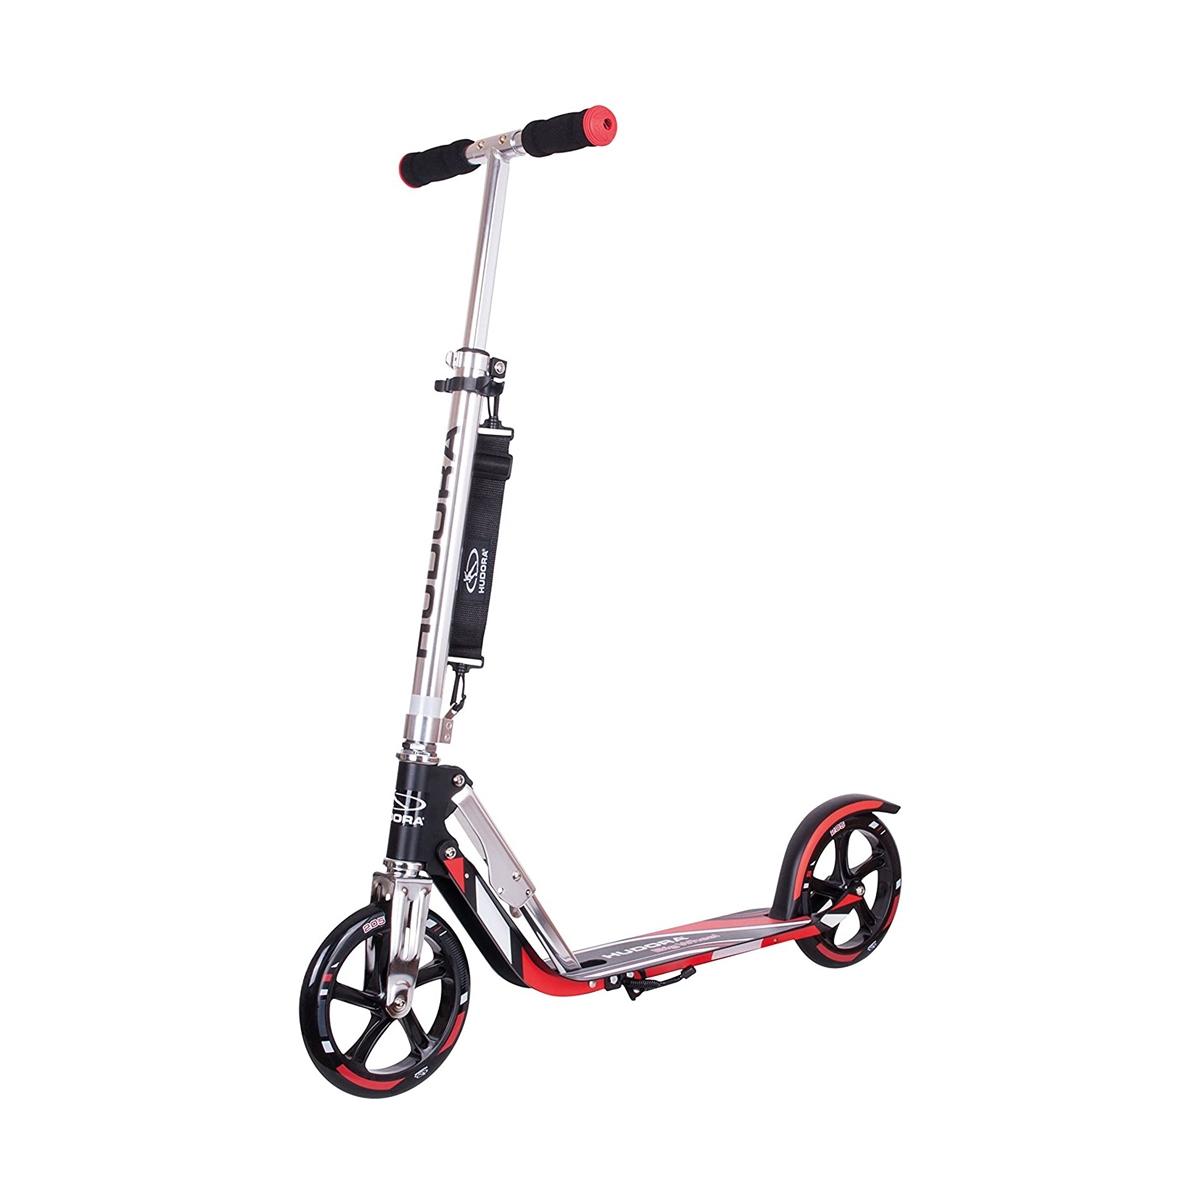 Monopattino Big Wheel 8'' 205RX 205mm Rx Design Nero/Argento/Rosso Sport